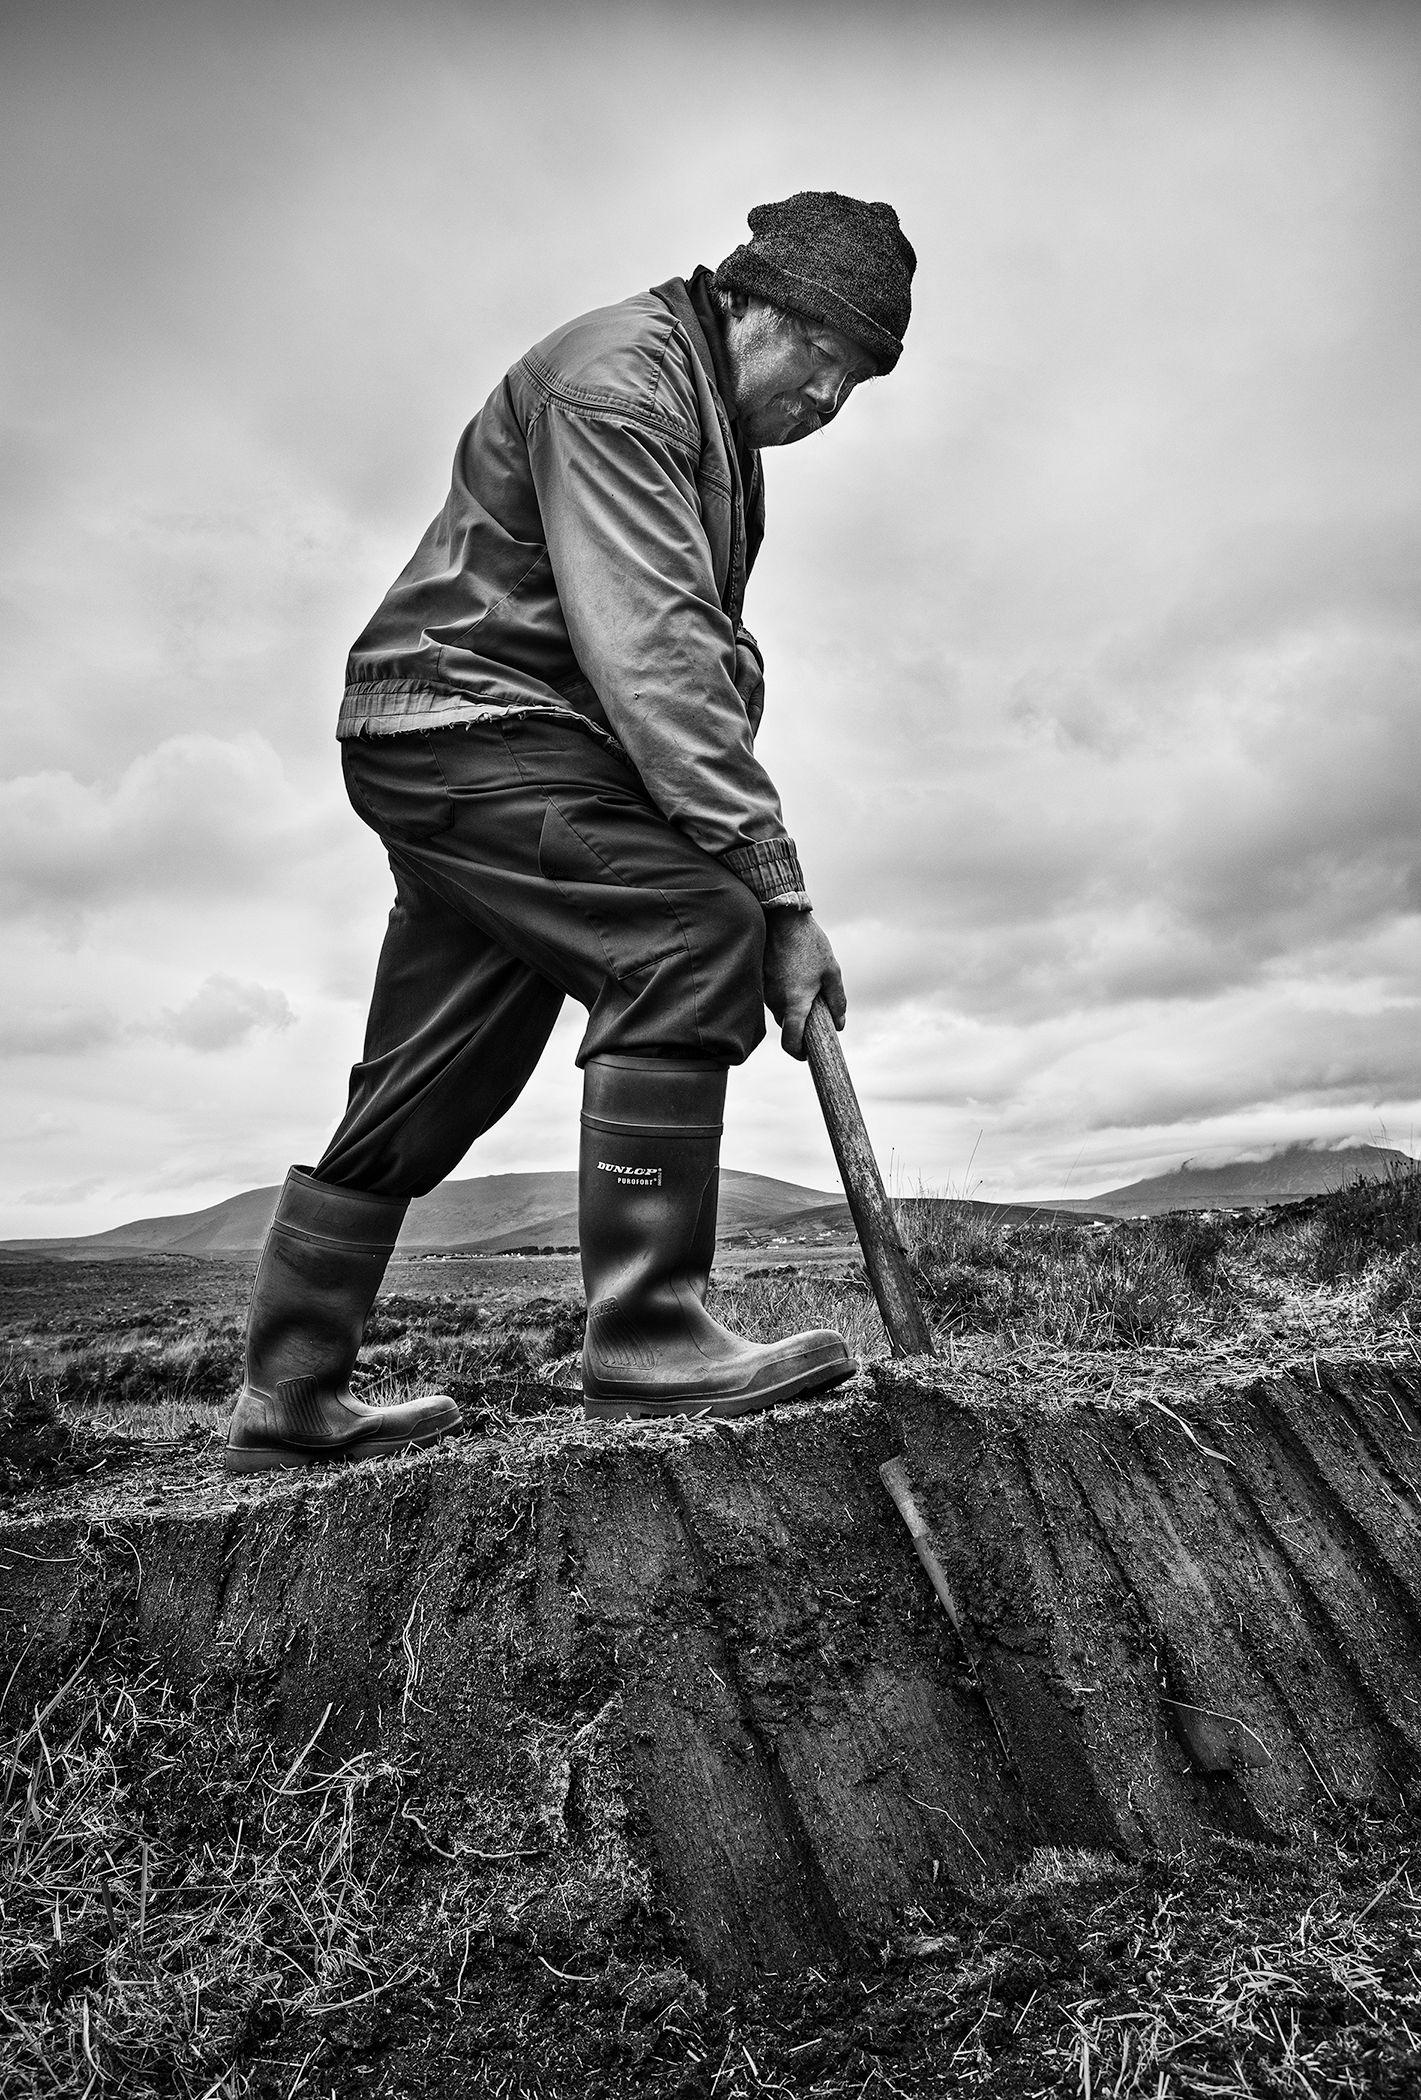 Lou Gogan, Turf Cutter, Achill Island,County Mayo.jpg